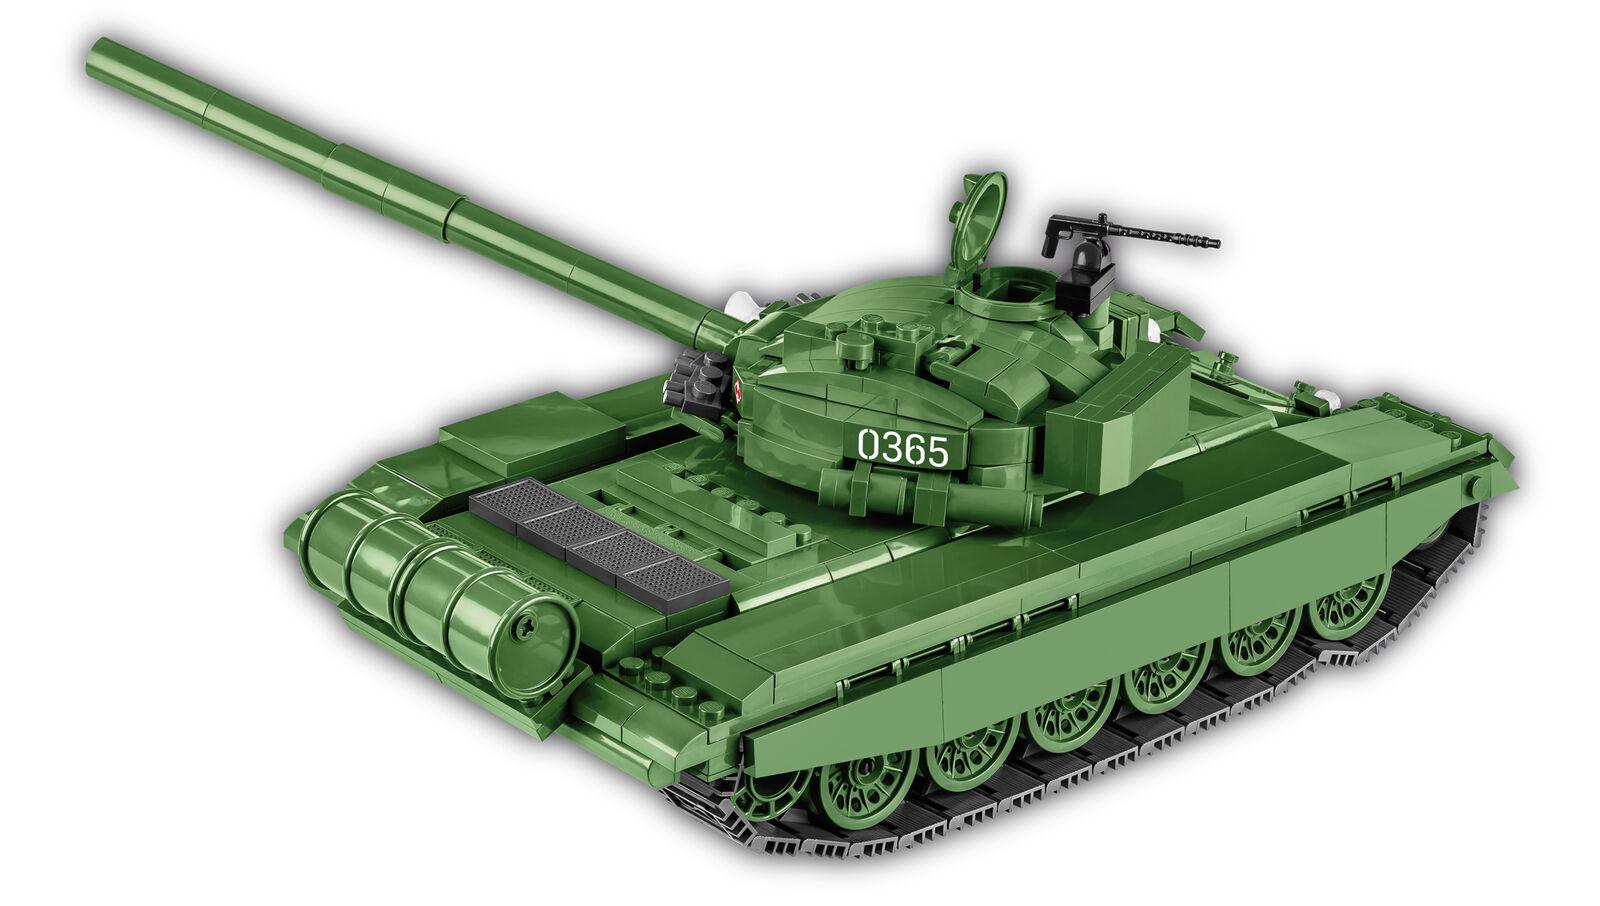 Construction Toys Tank T-72 M1 - Soviet Basistank Tanks